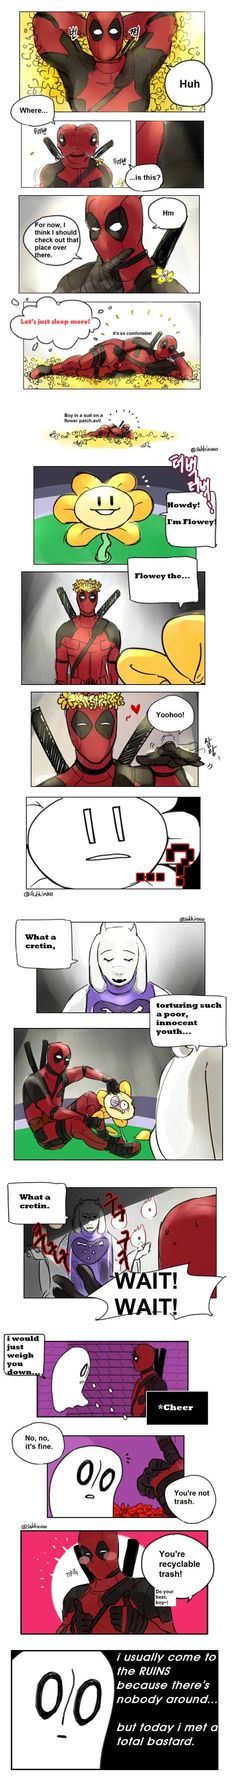 Lol Deadpool